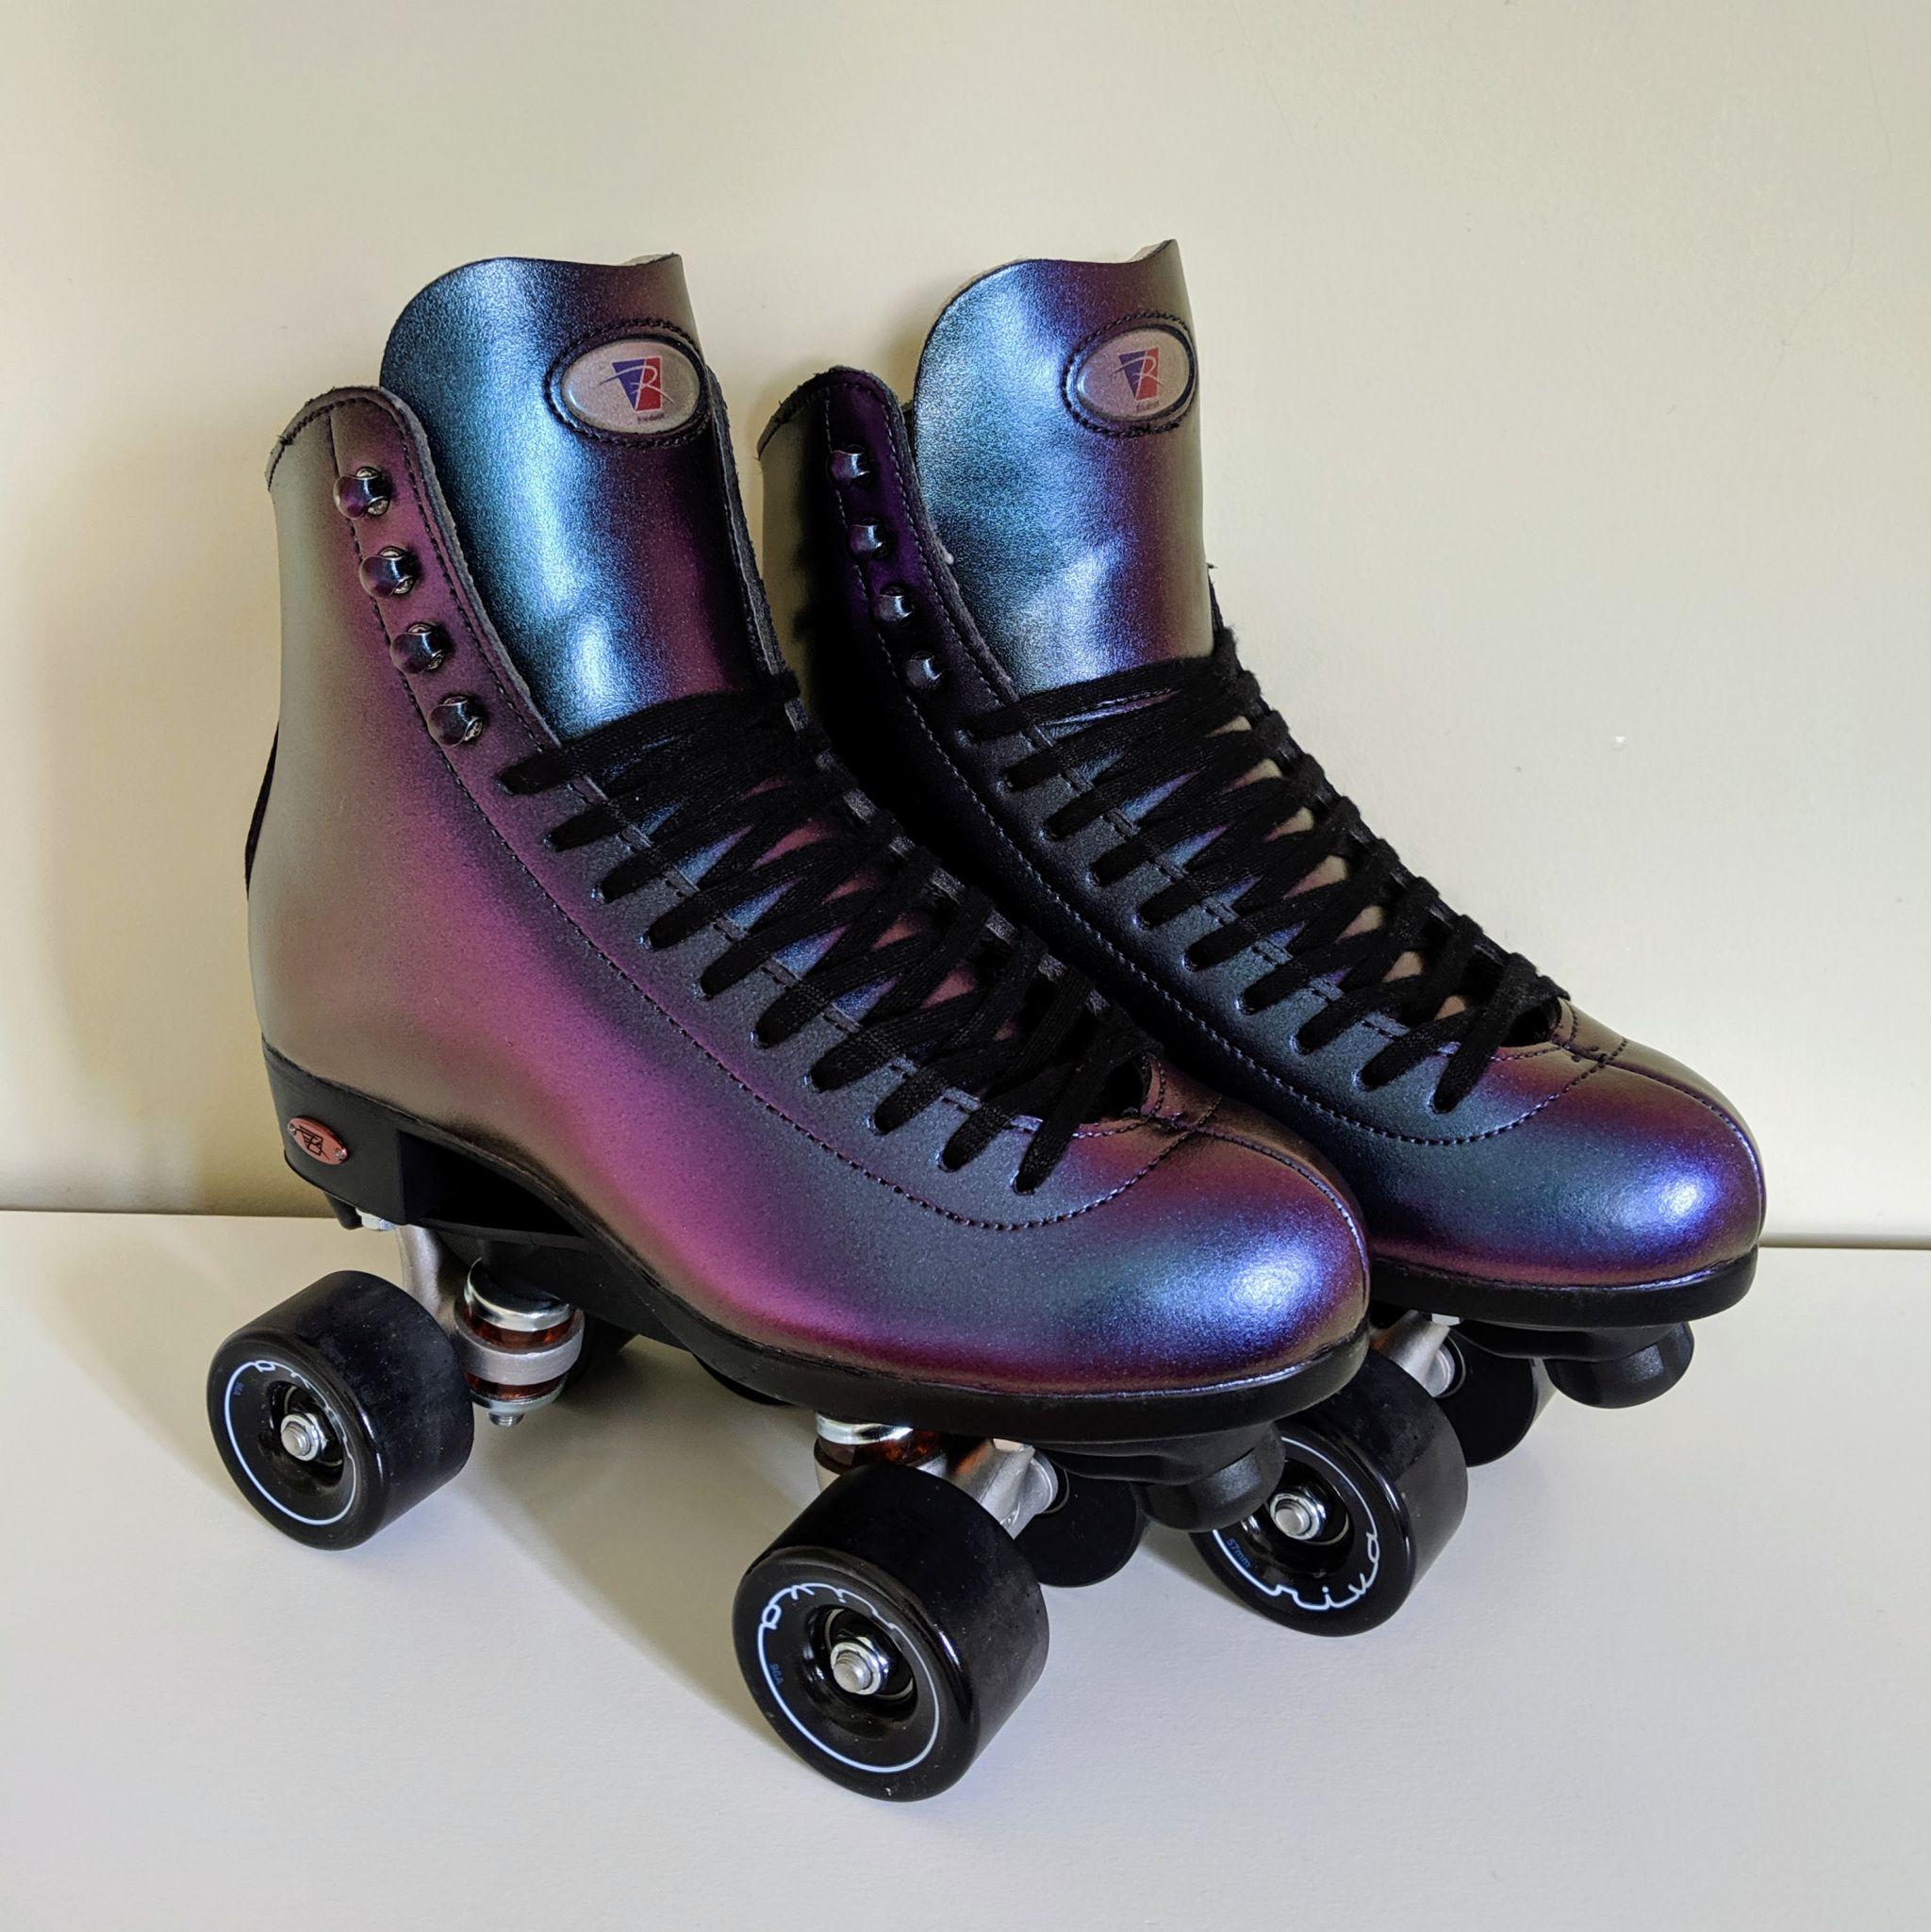 How To]: Oil Slick Roller Skate Boots